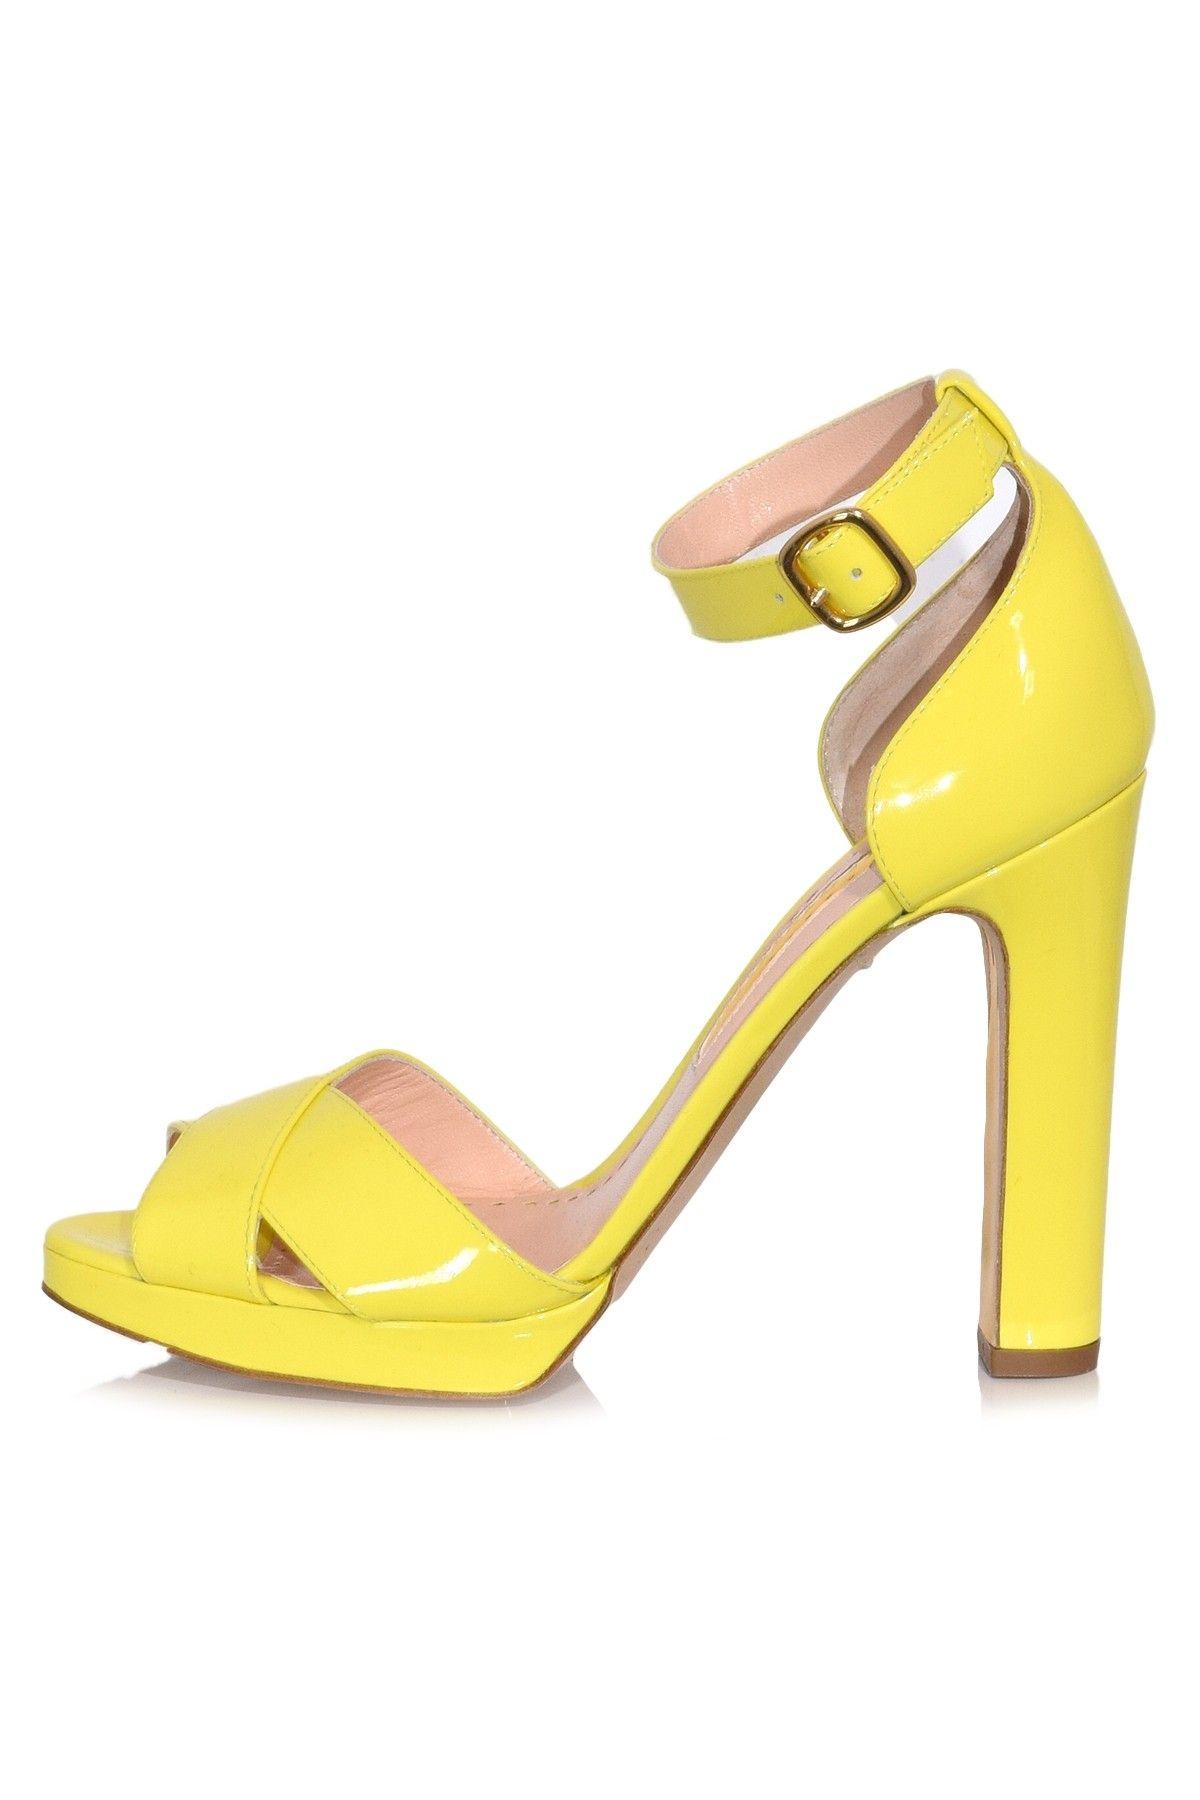 2a1b3f130 Meadow Patent Heel in Citrus in 2019 | Hampden Shoes | Patent heels ...